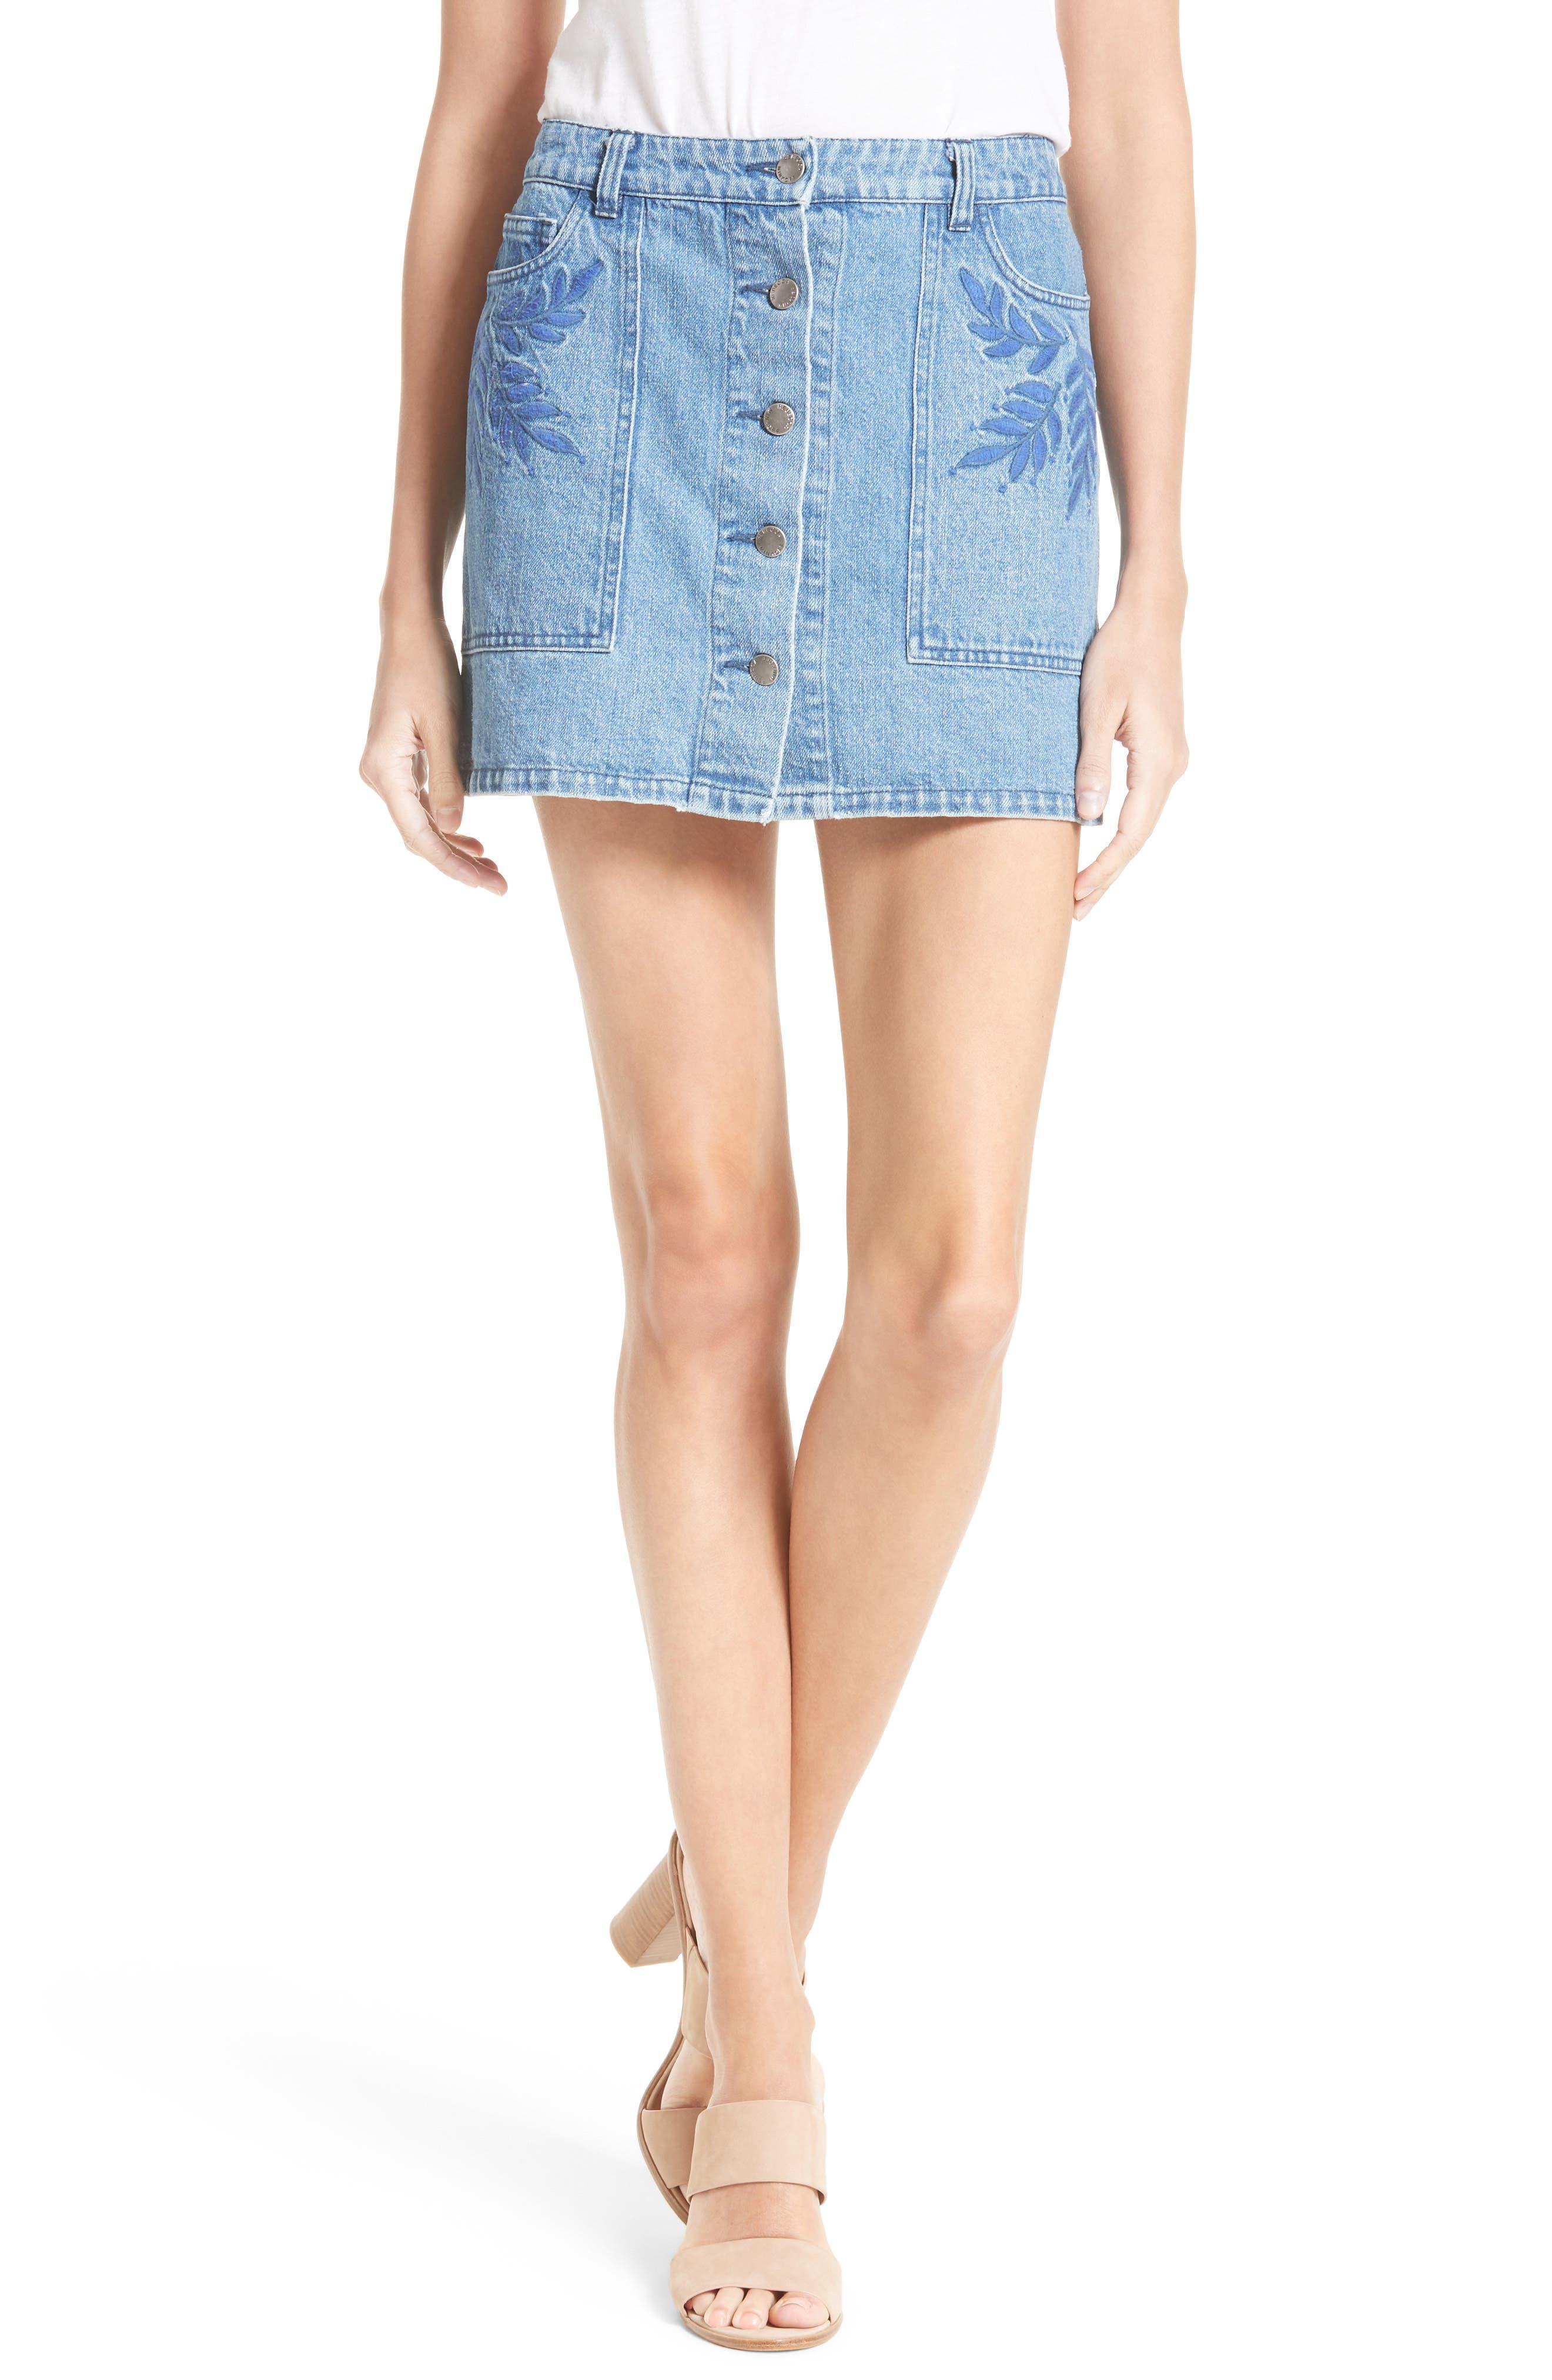 Rebecca Minkoff Rufus Embroidered Denim Miniskirt